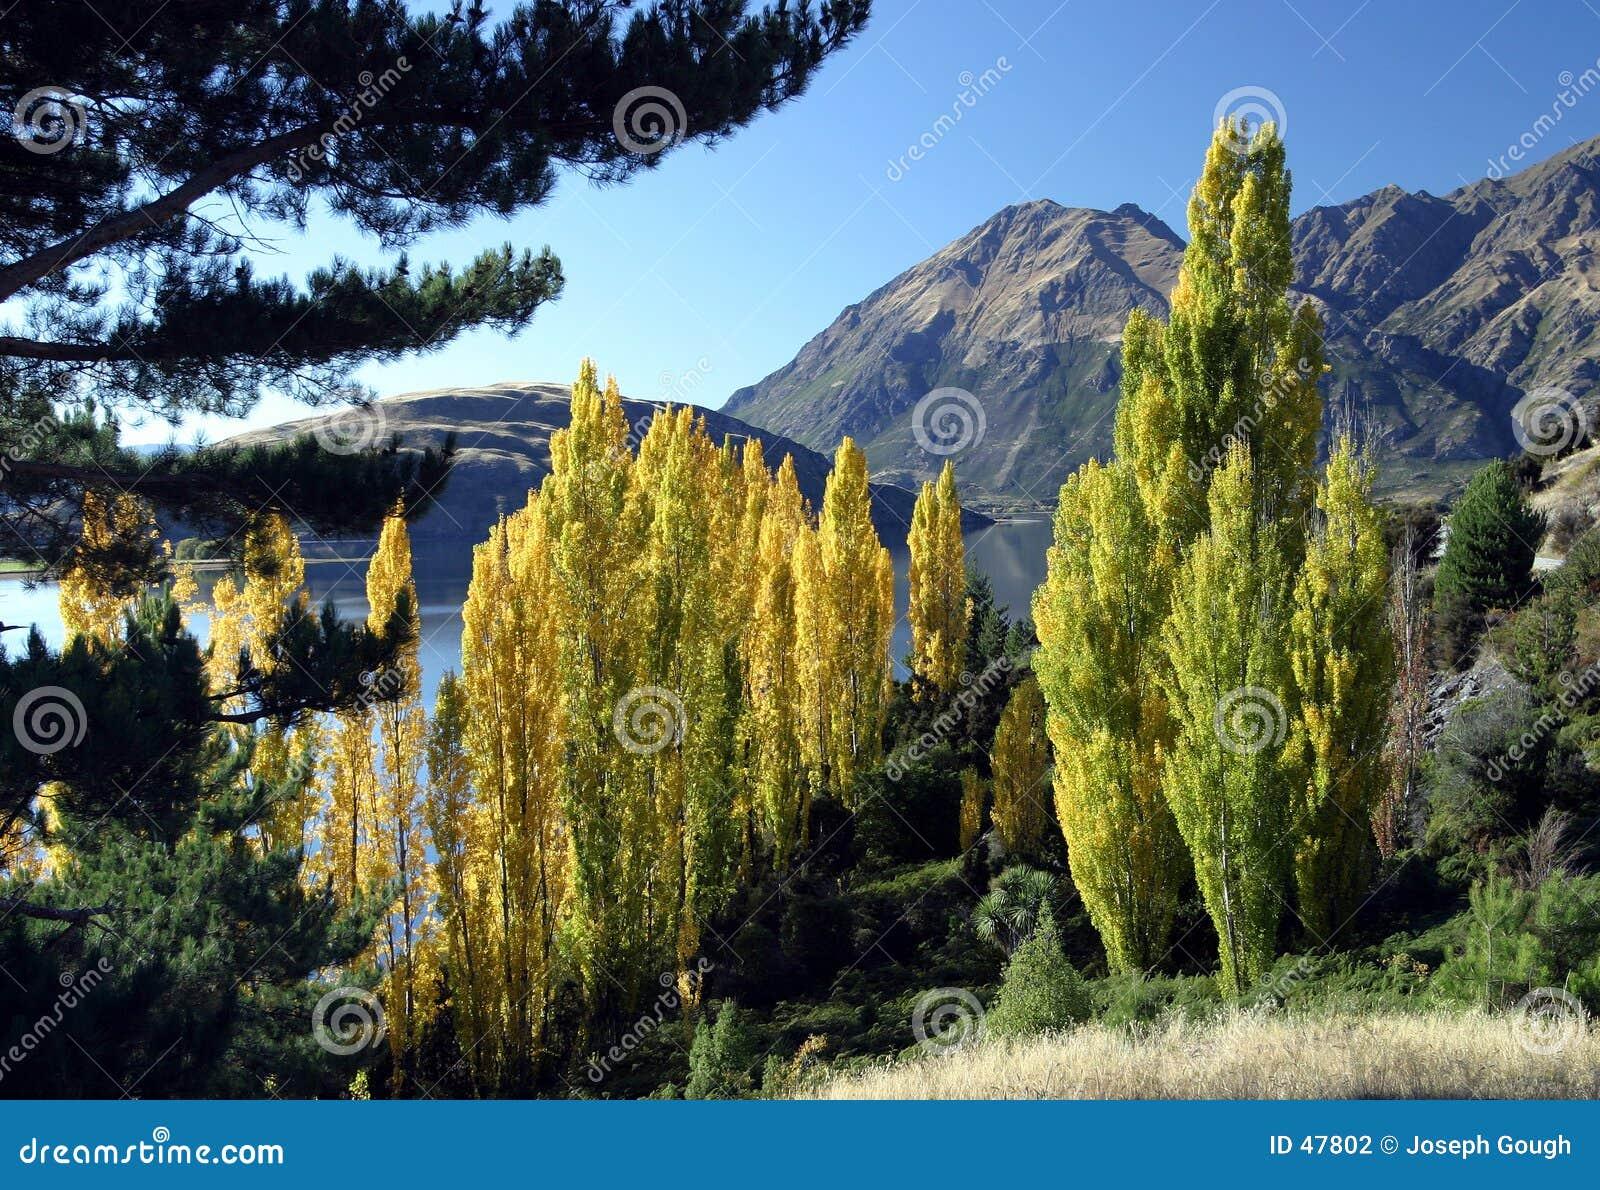 Mountain View, Nuova Zelanda